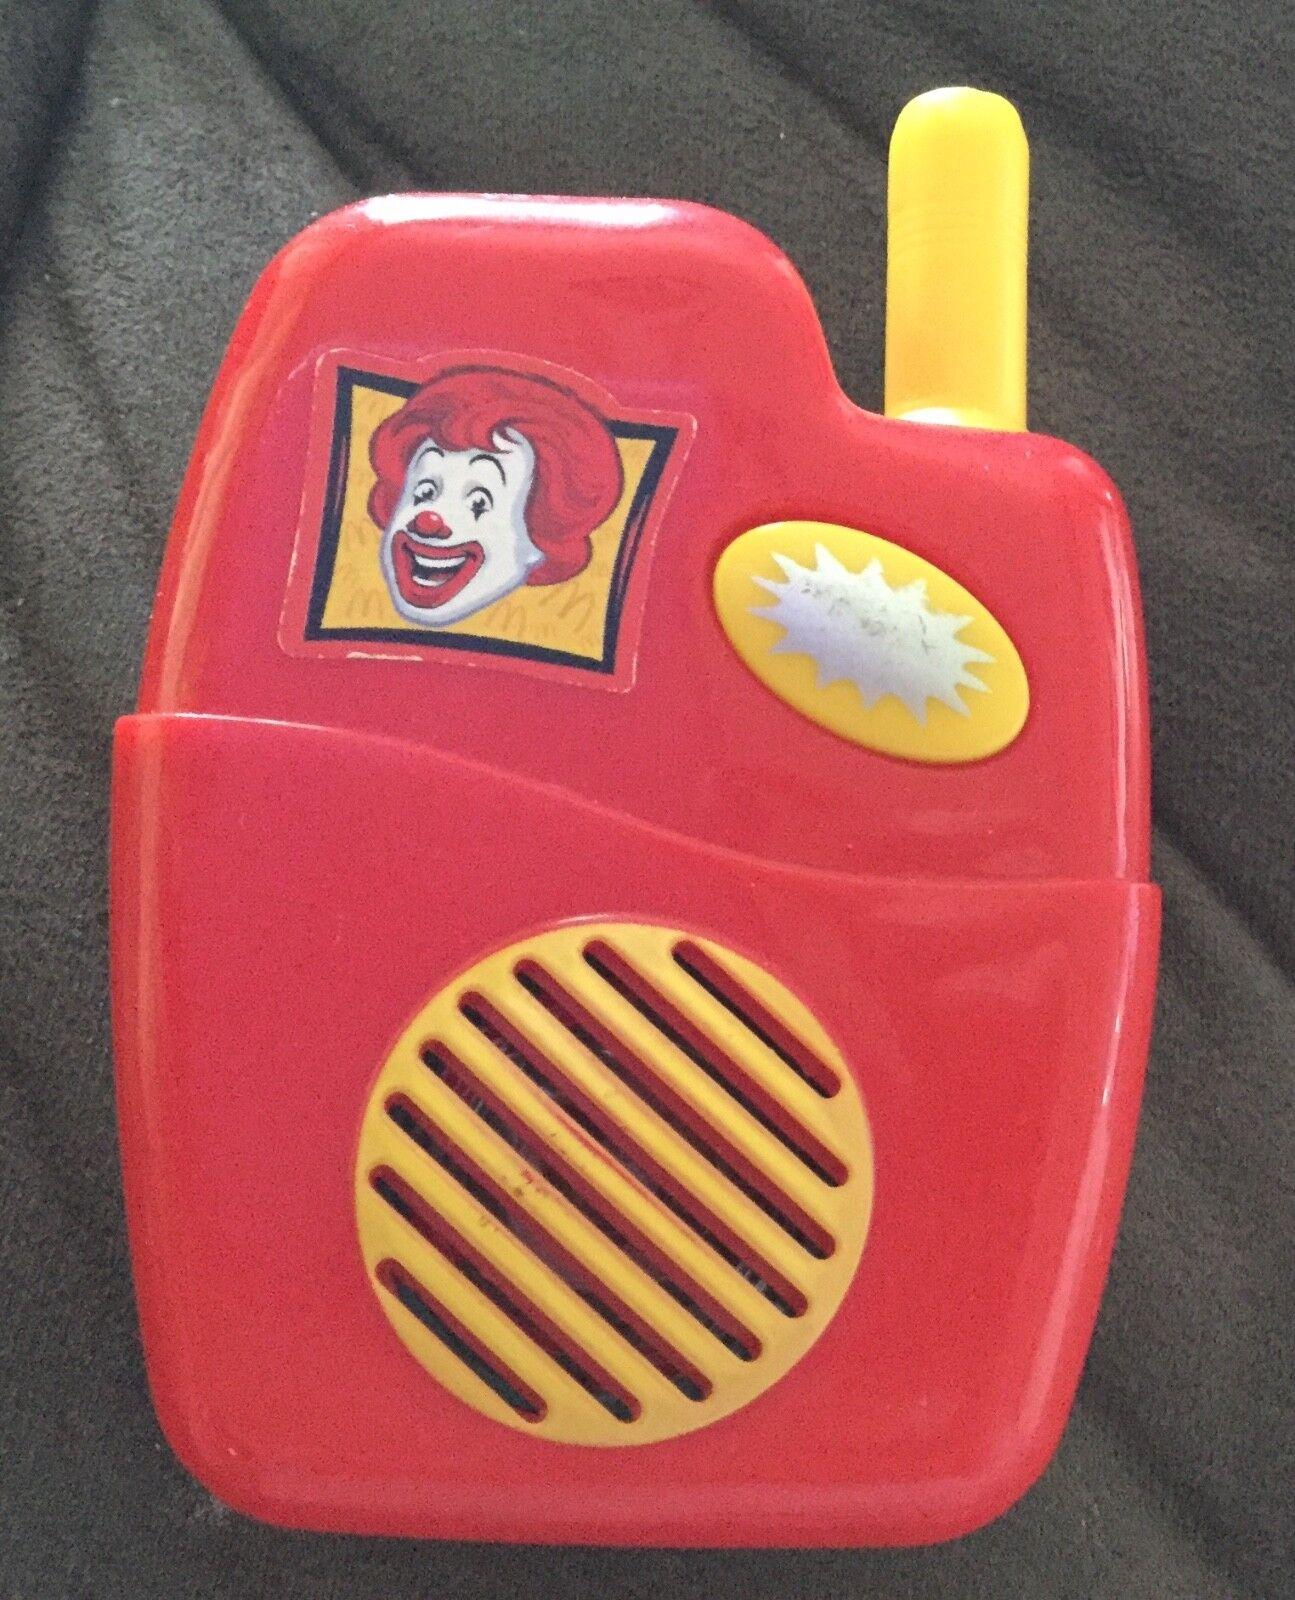 McDonald's Drive Thru Walkie Talkie Fake Play Toys WORKS GREAT  2004